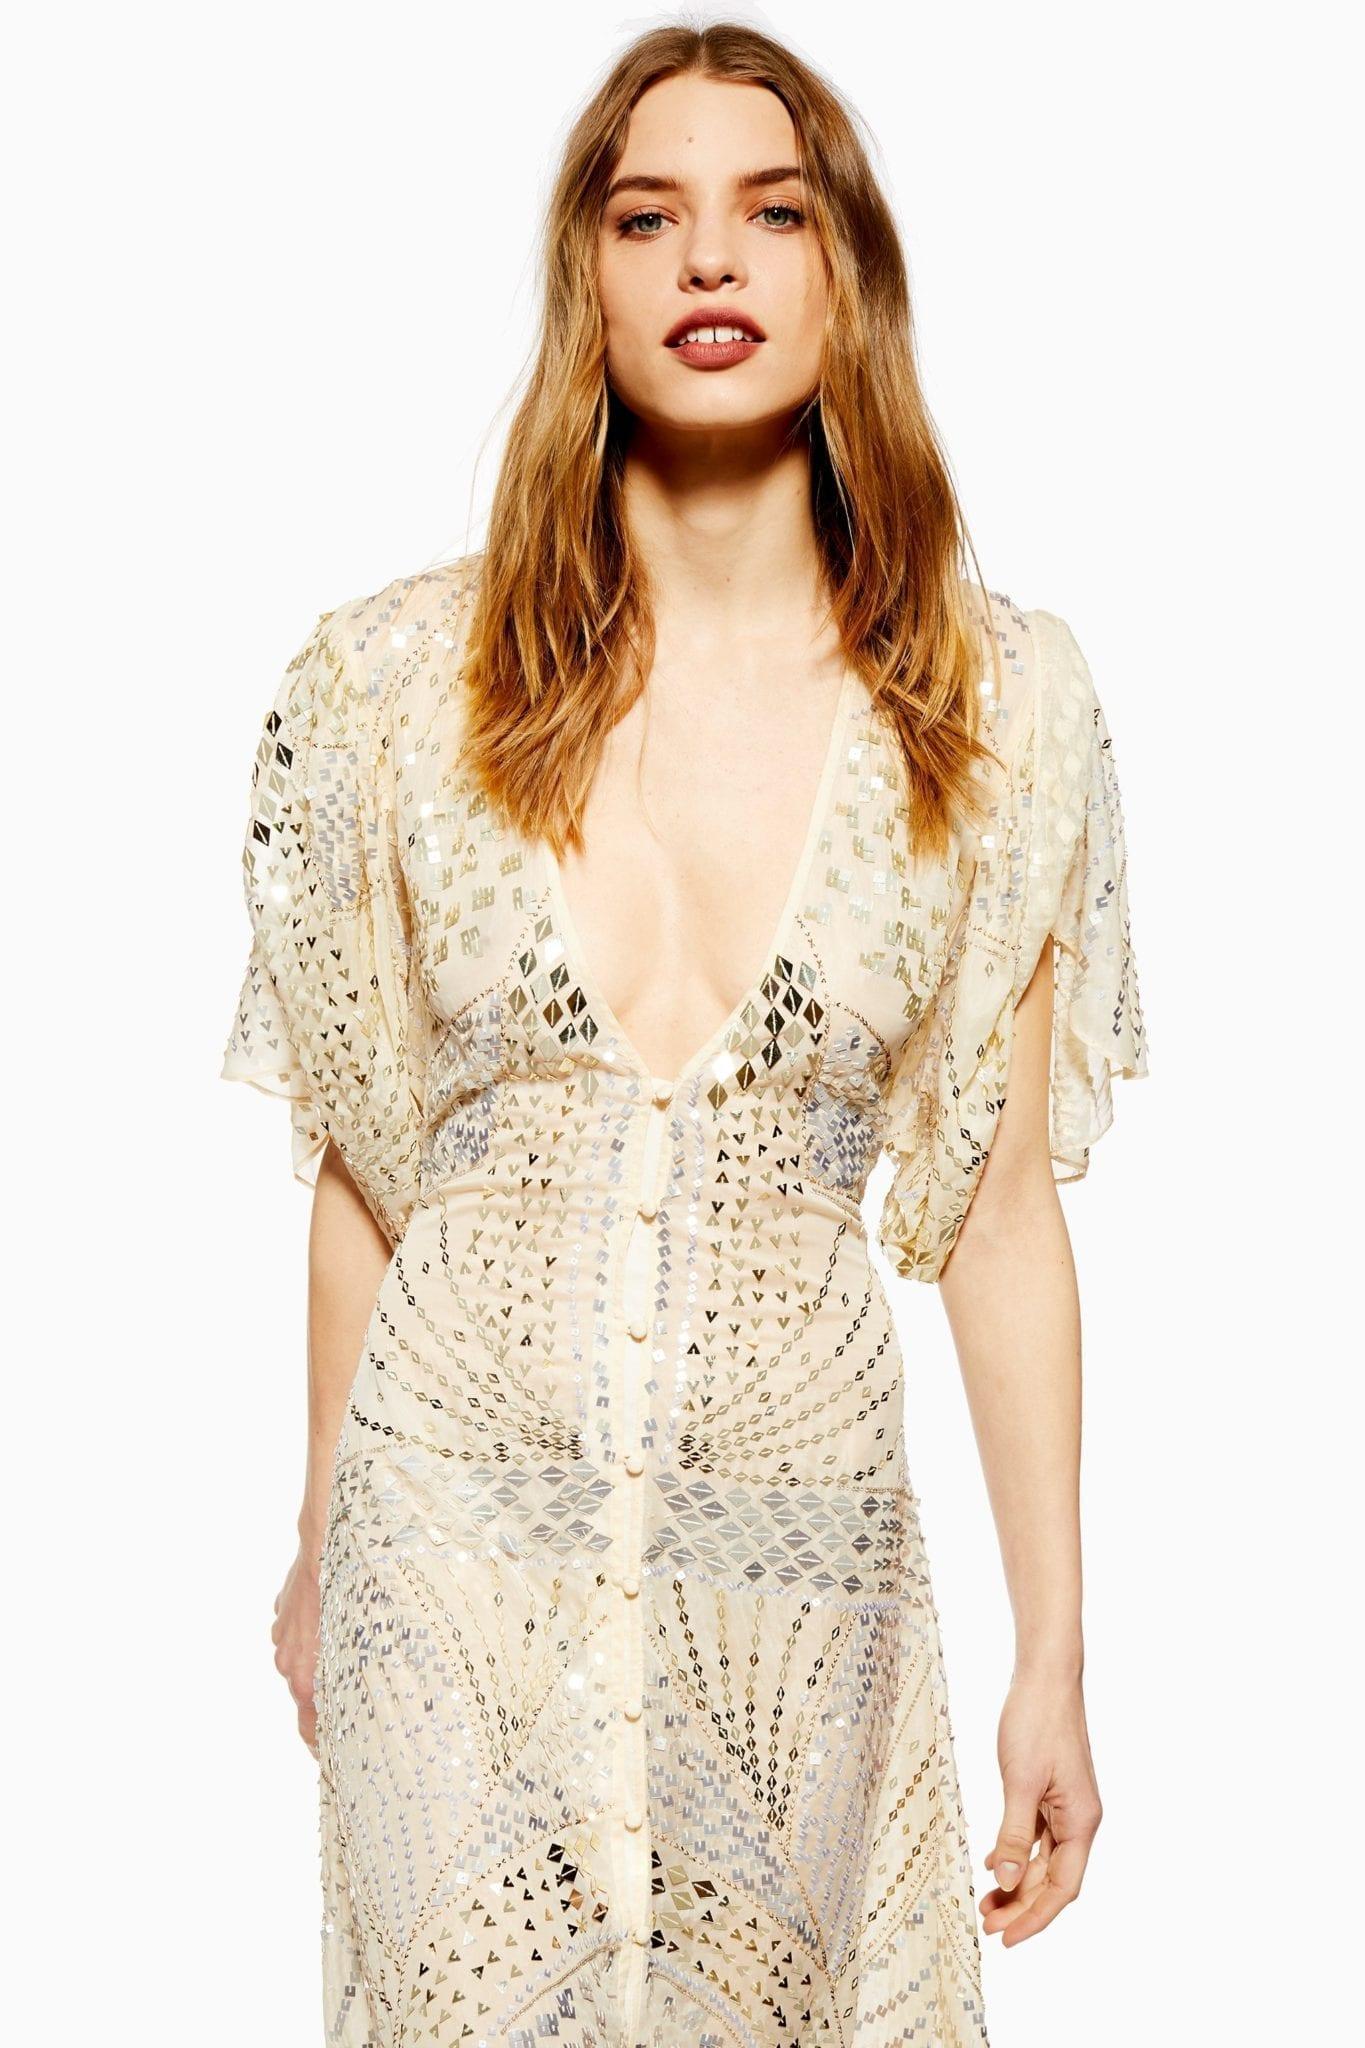 e9f5590026b5ca TOPSHOP Premium Embellished Midi Dress - We Select Dresses